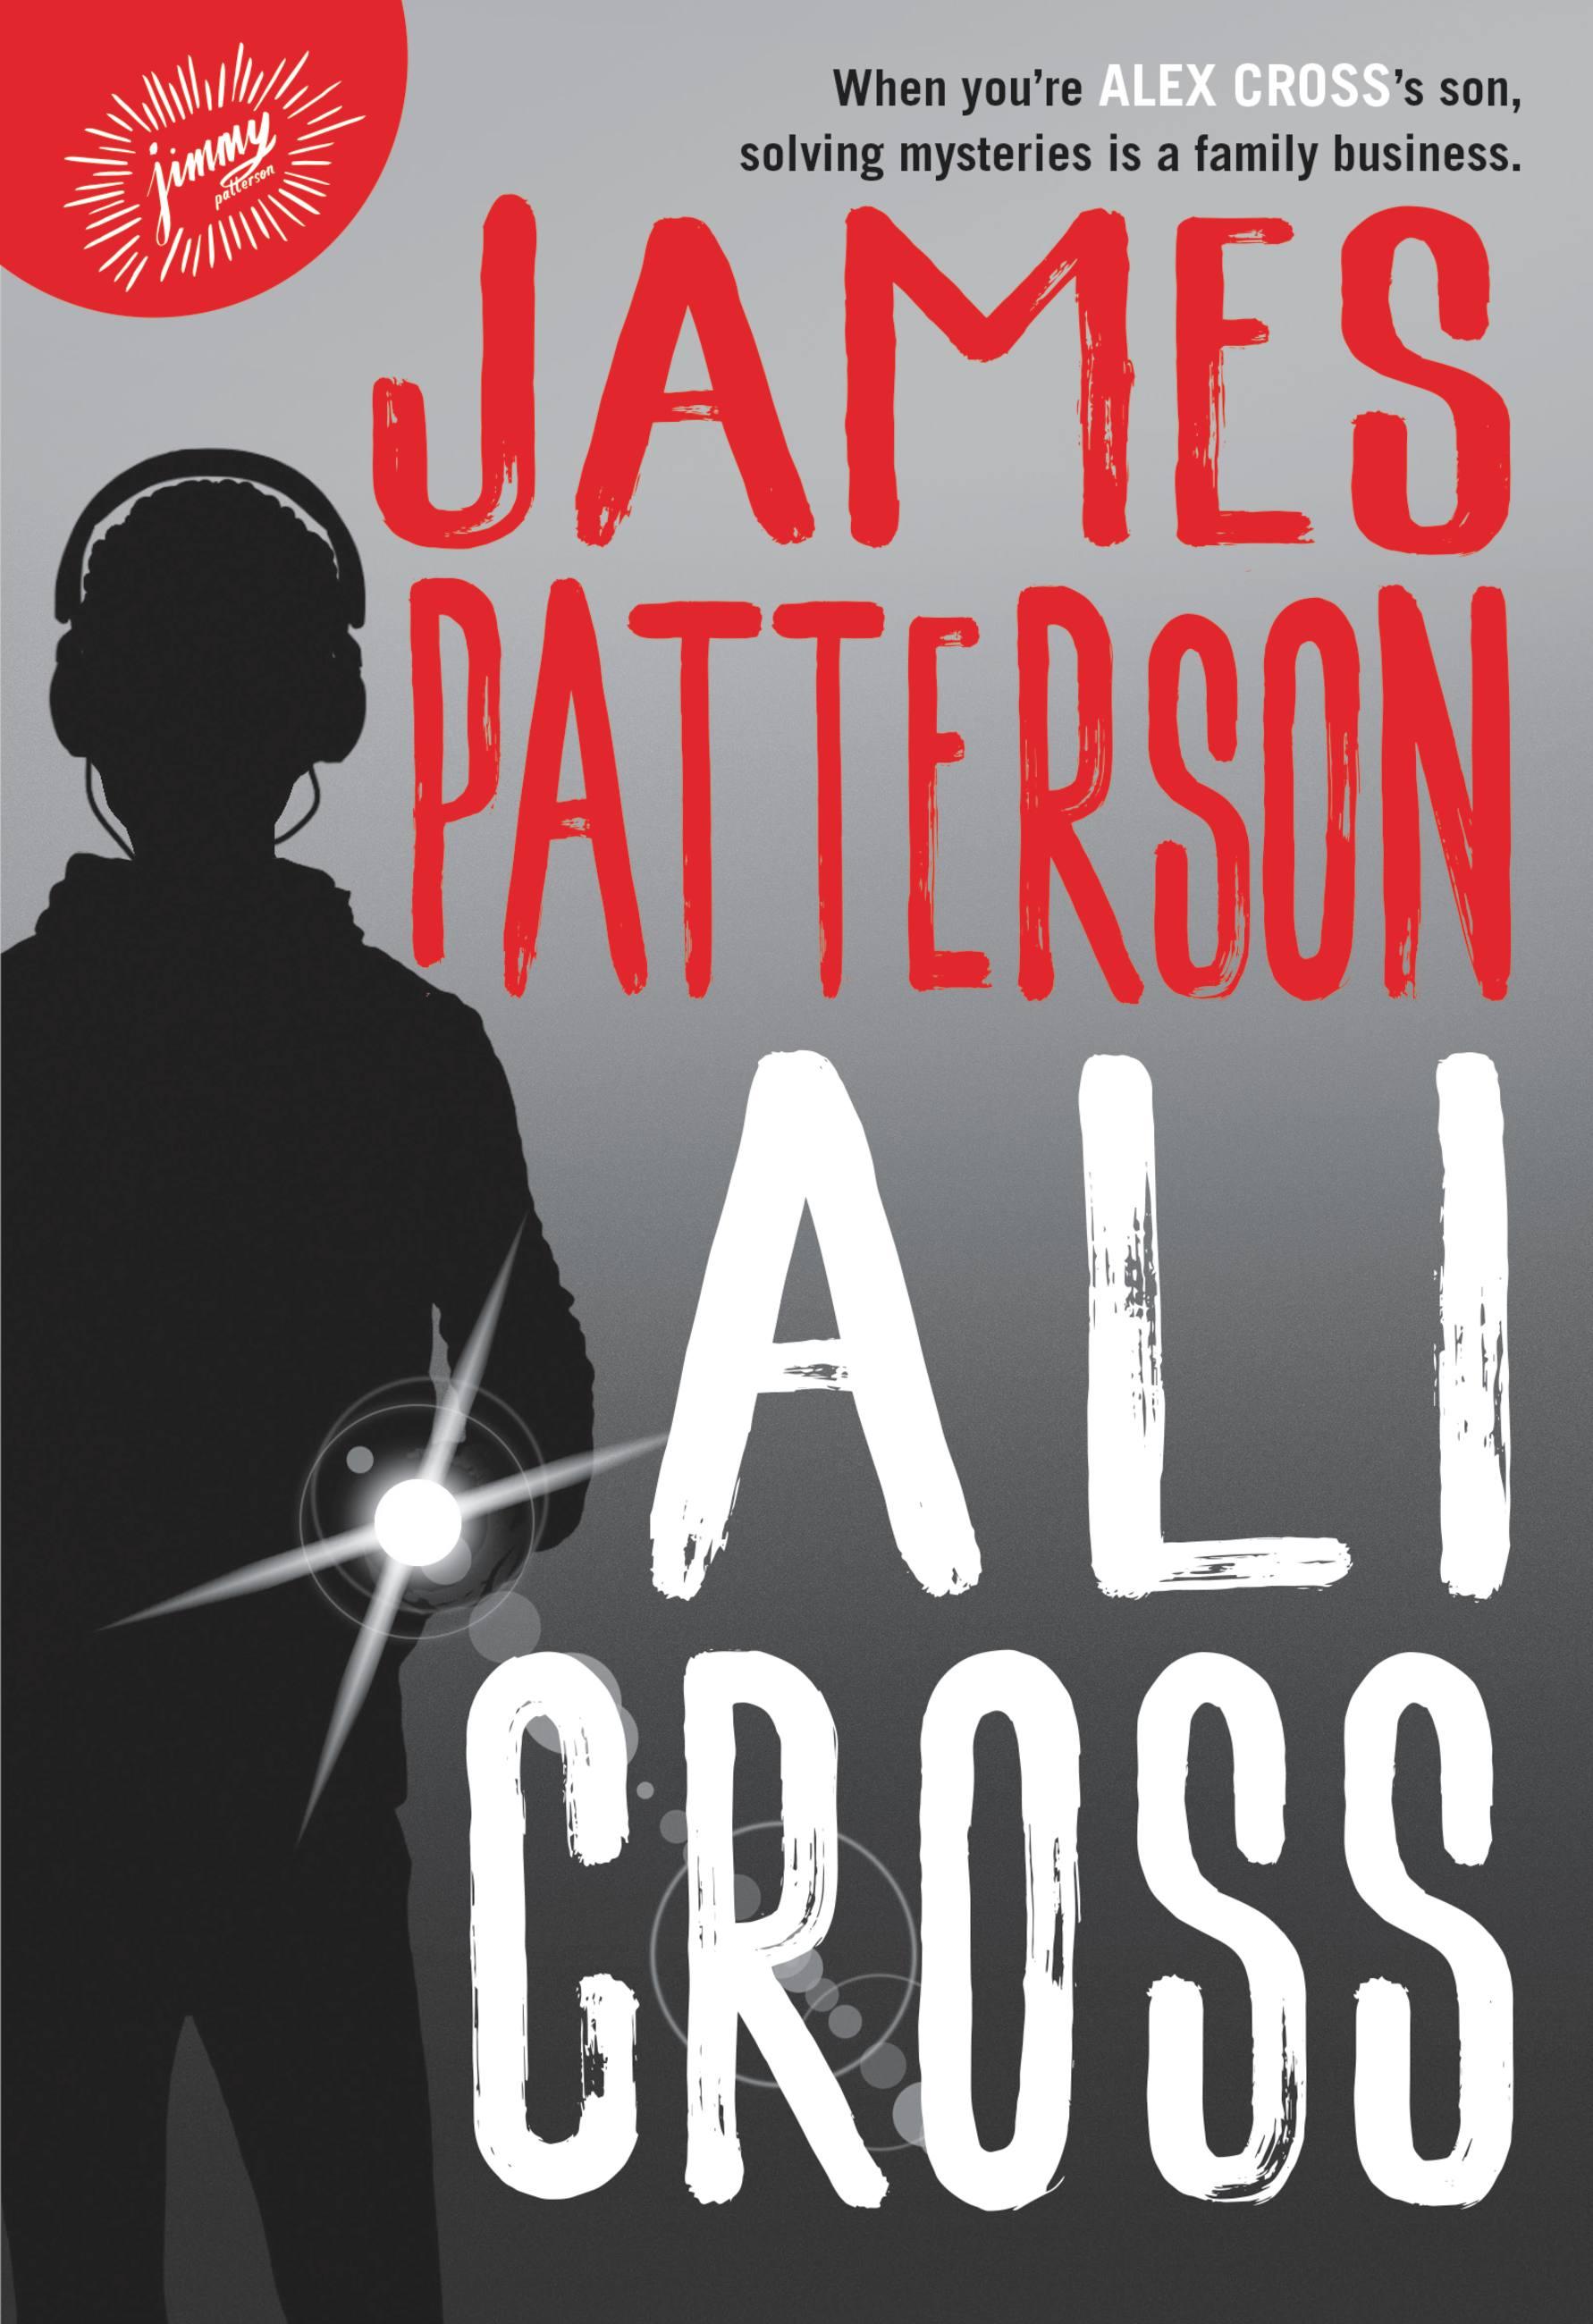 Ali Cross [electronic resource]